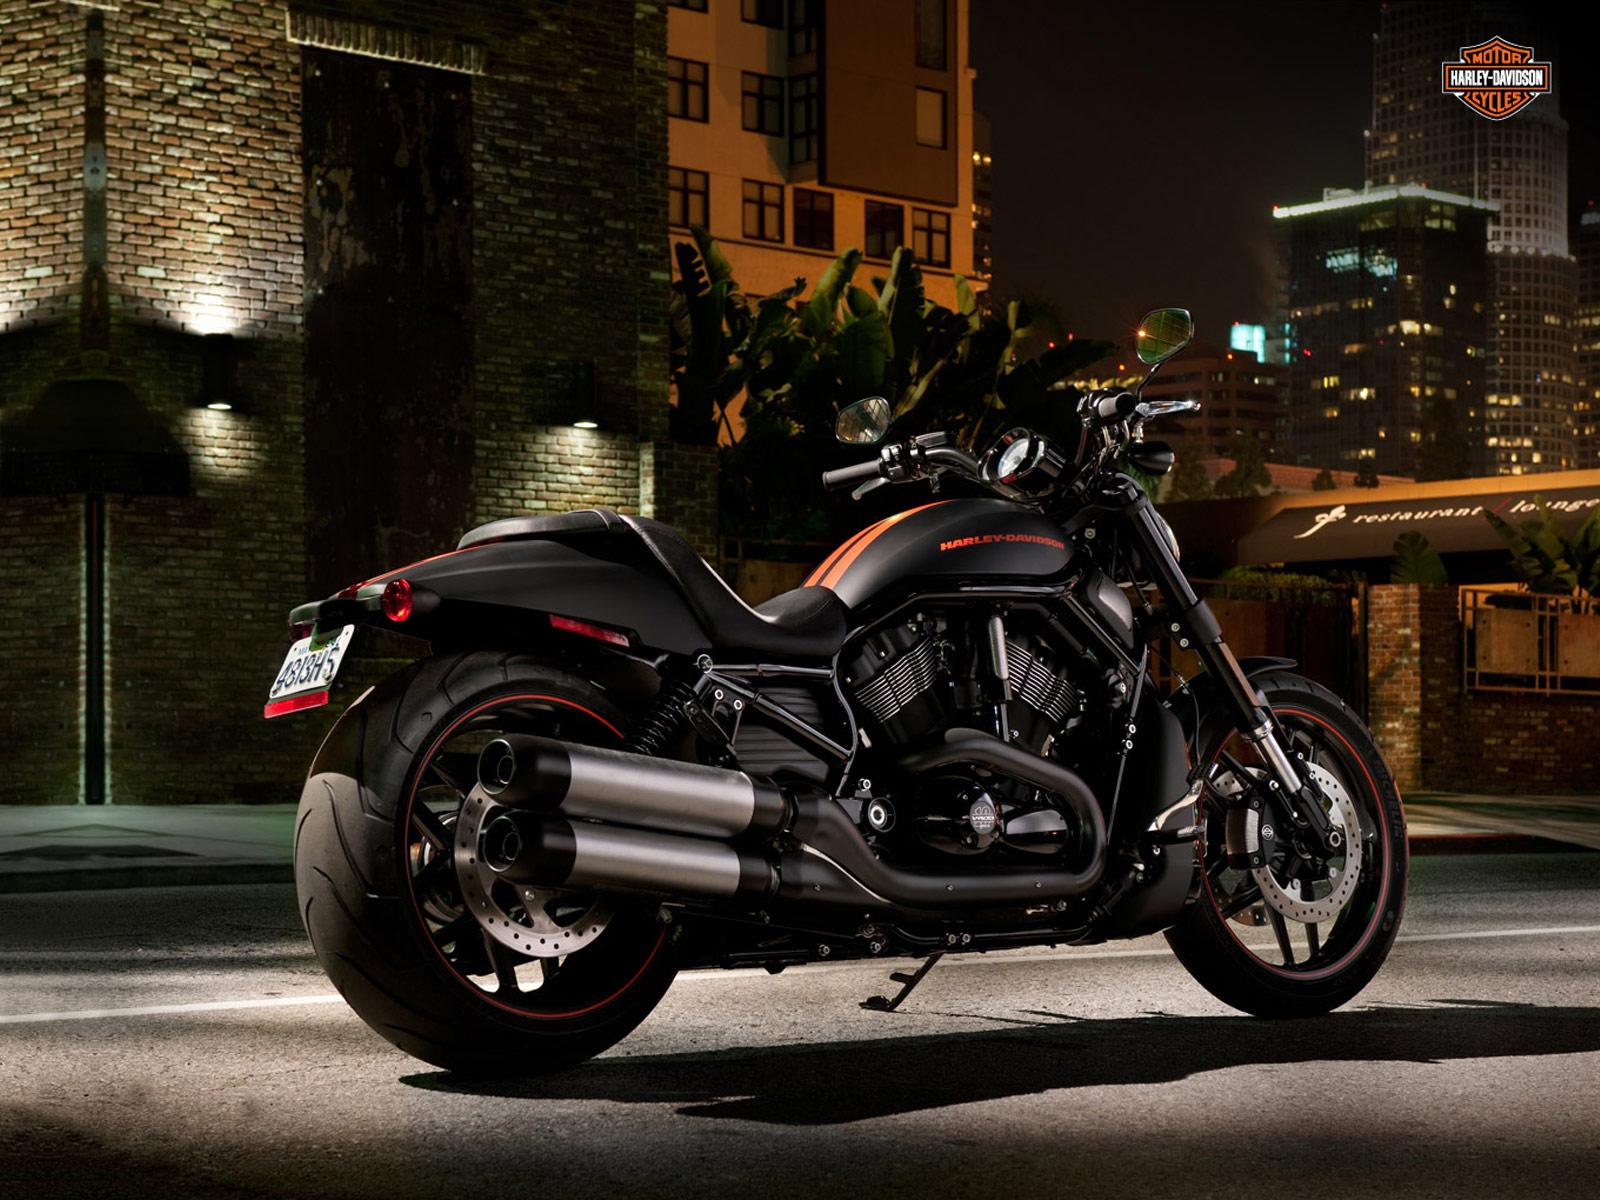 Review 2012 Harley Davidson Vrscdx Night Rod Special: 2012 Harley Davidson Vrscdx Night Rod Special Review